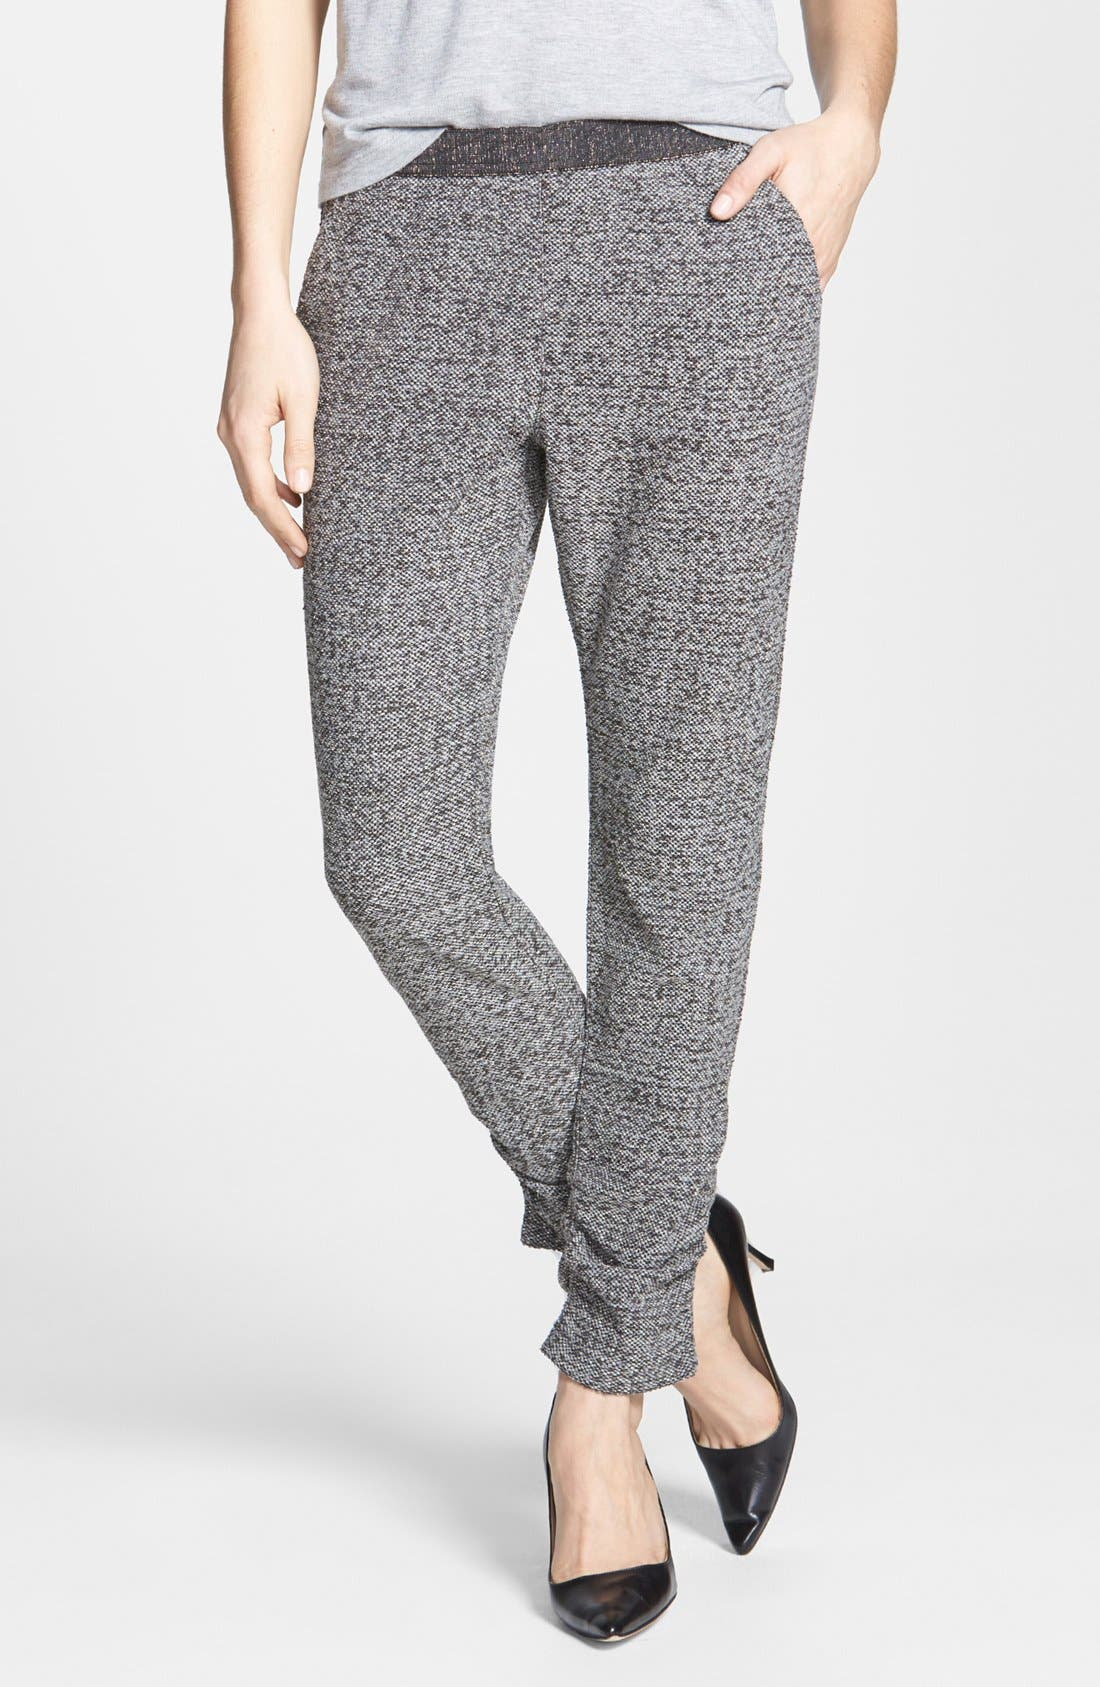 Alternate Image 1 Selected - Free People 'Milo' Metallic Pants